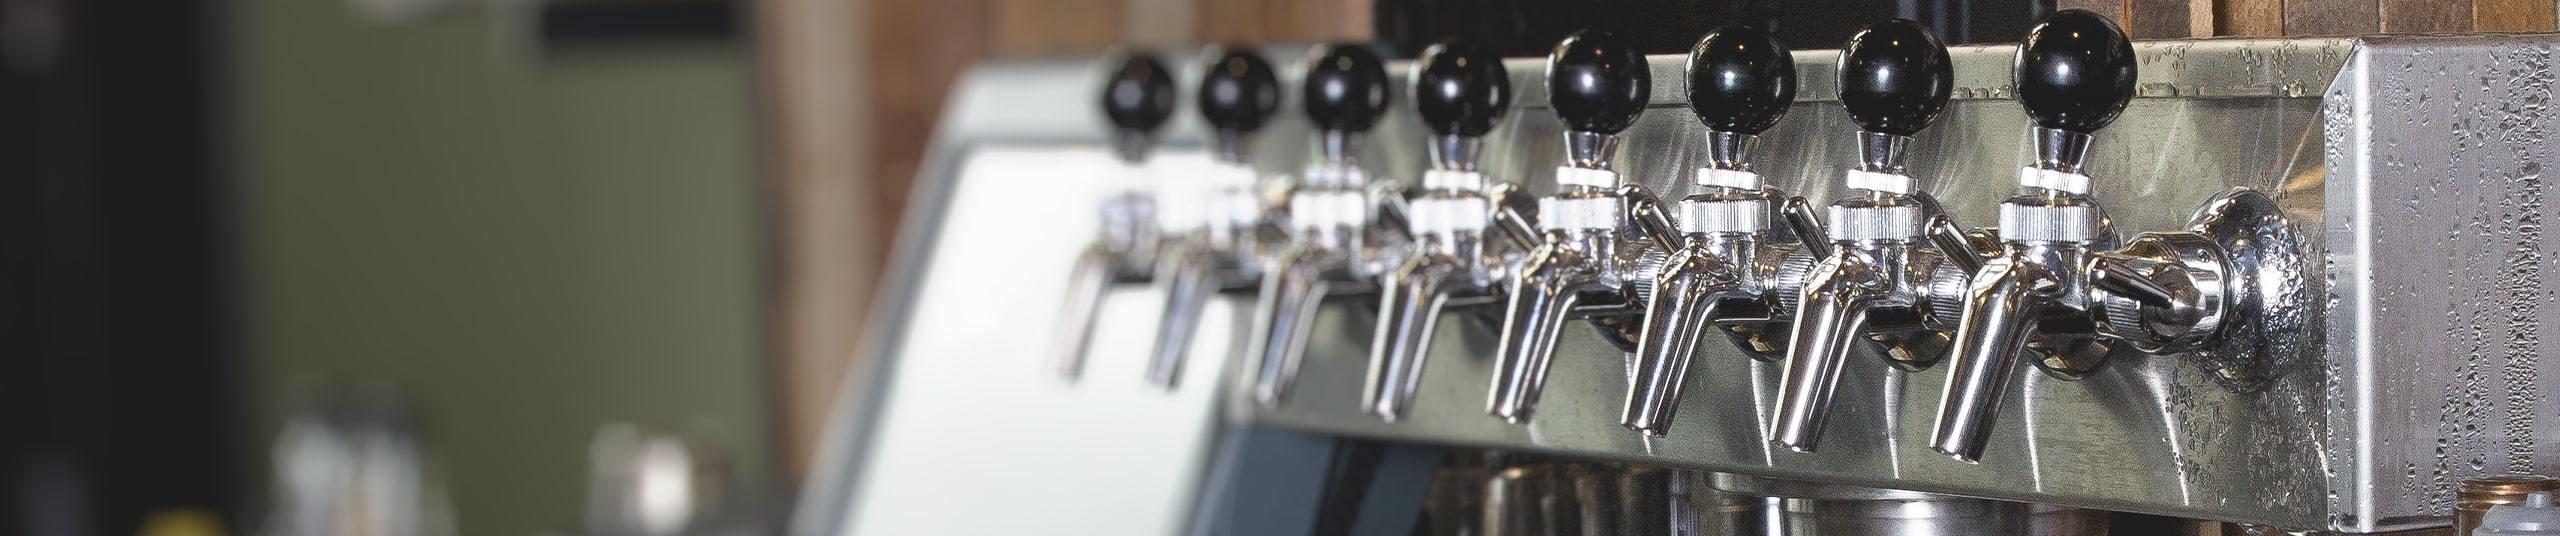 draft beer faucets shanks